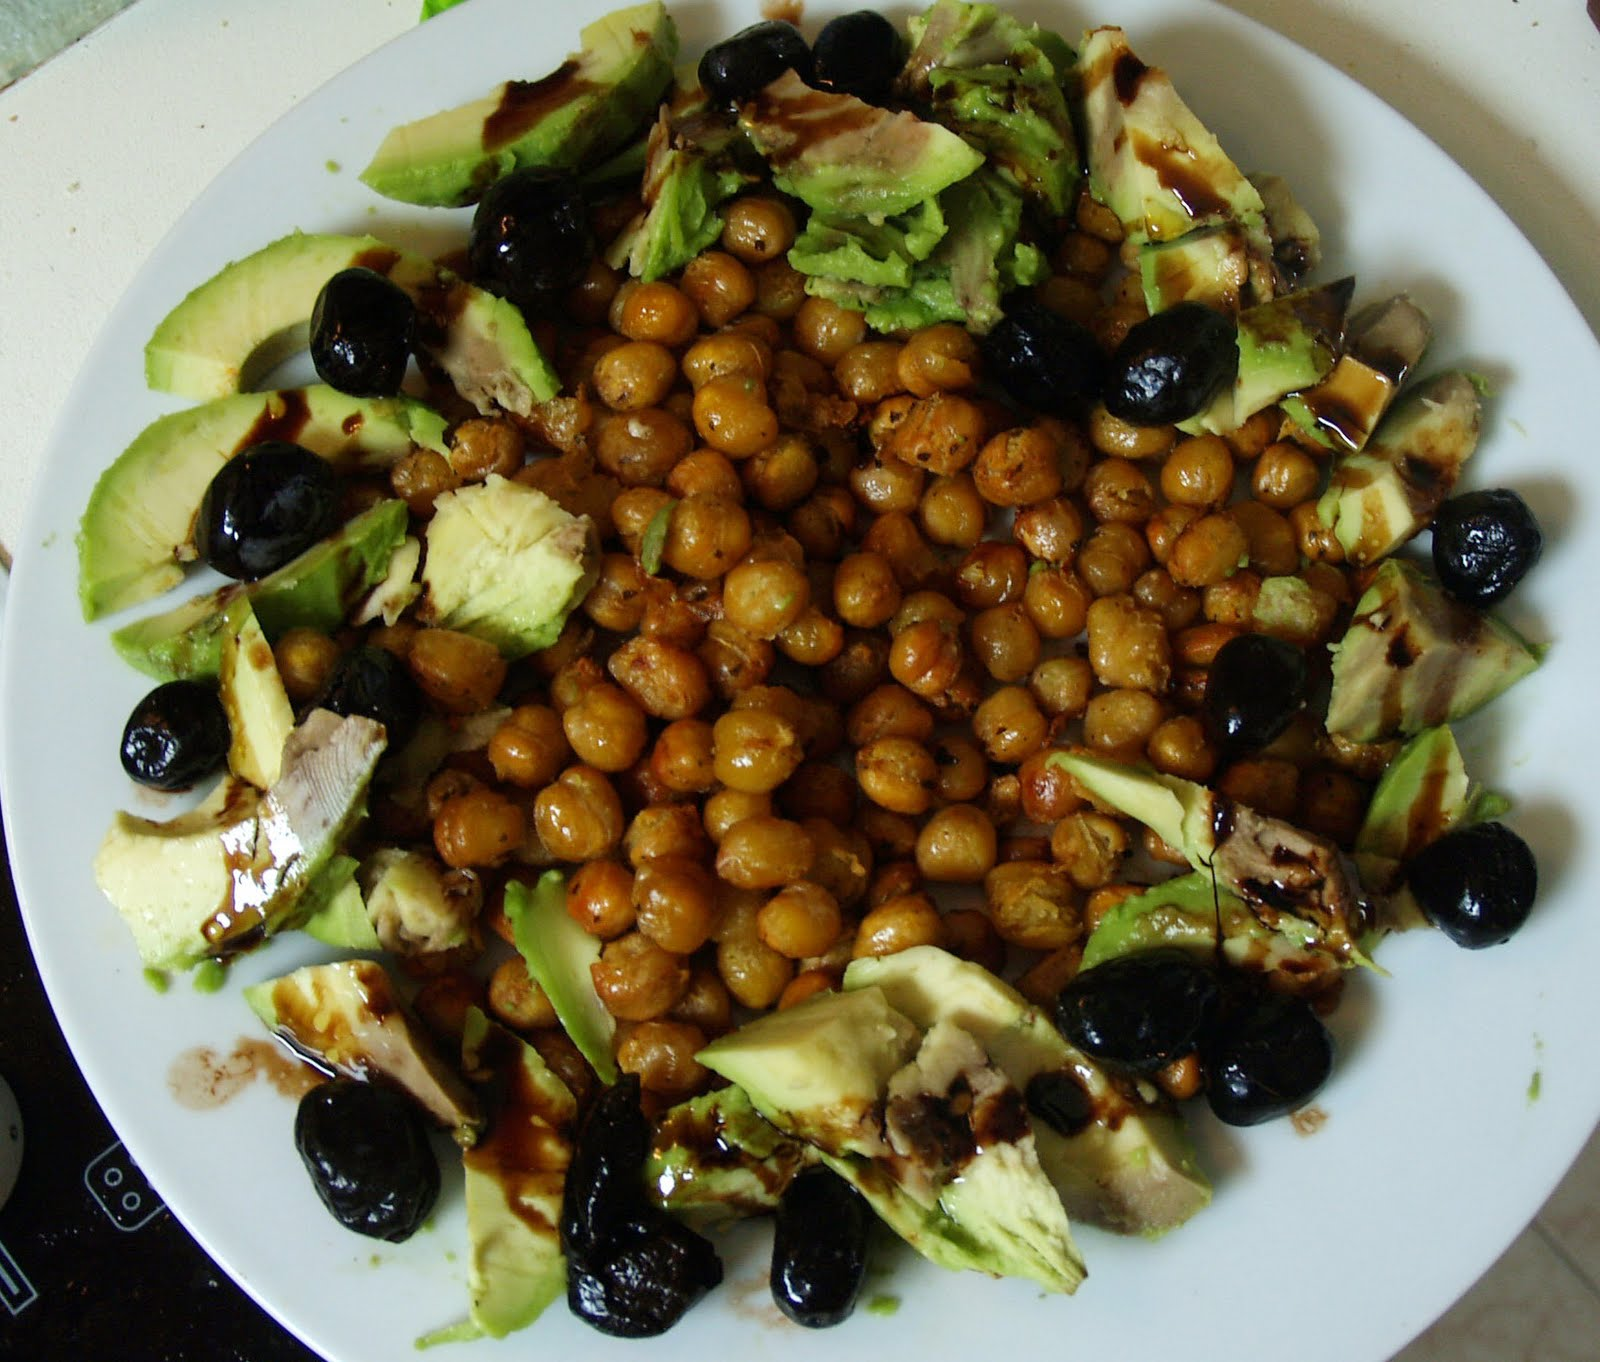 Comida para uno ensalada damasco ensalada de garbanzos - Ensalada de garbanzos light ...